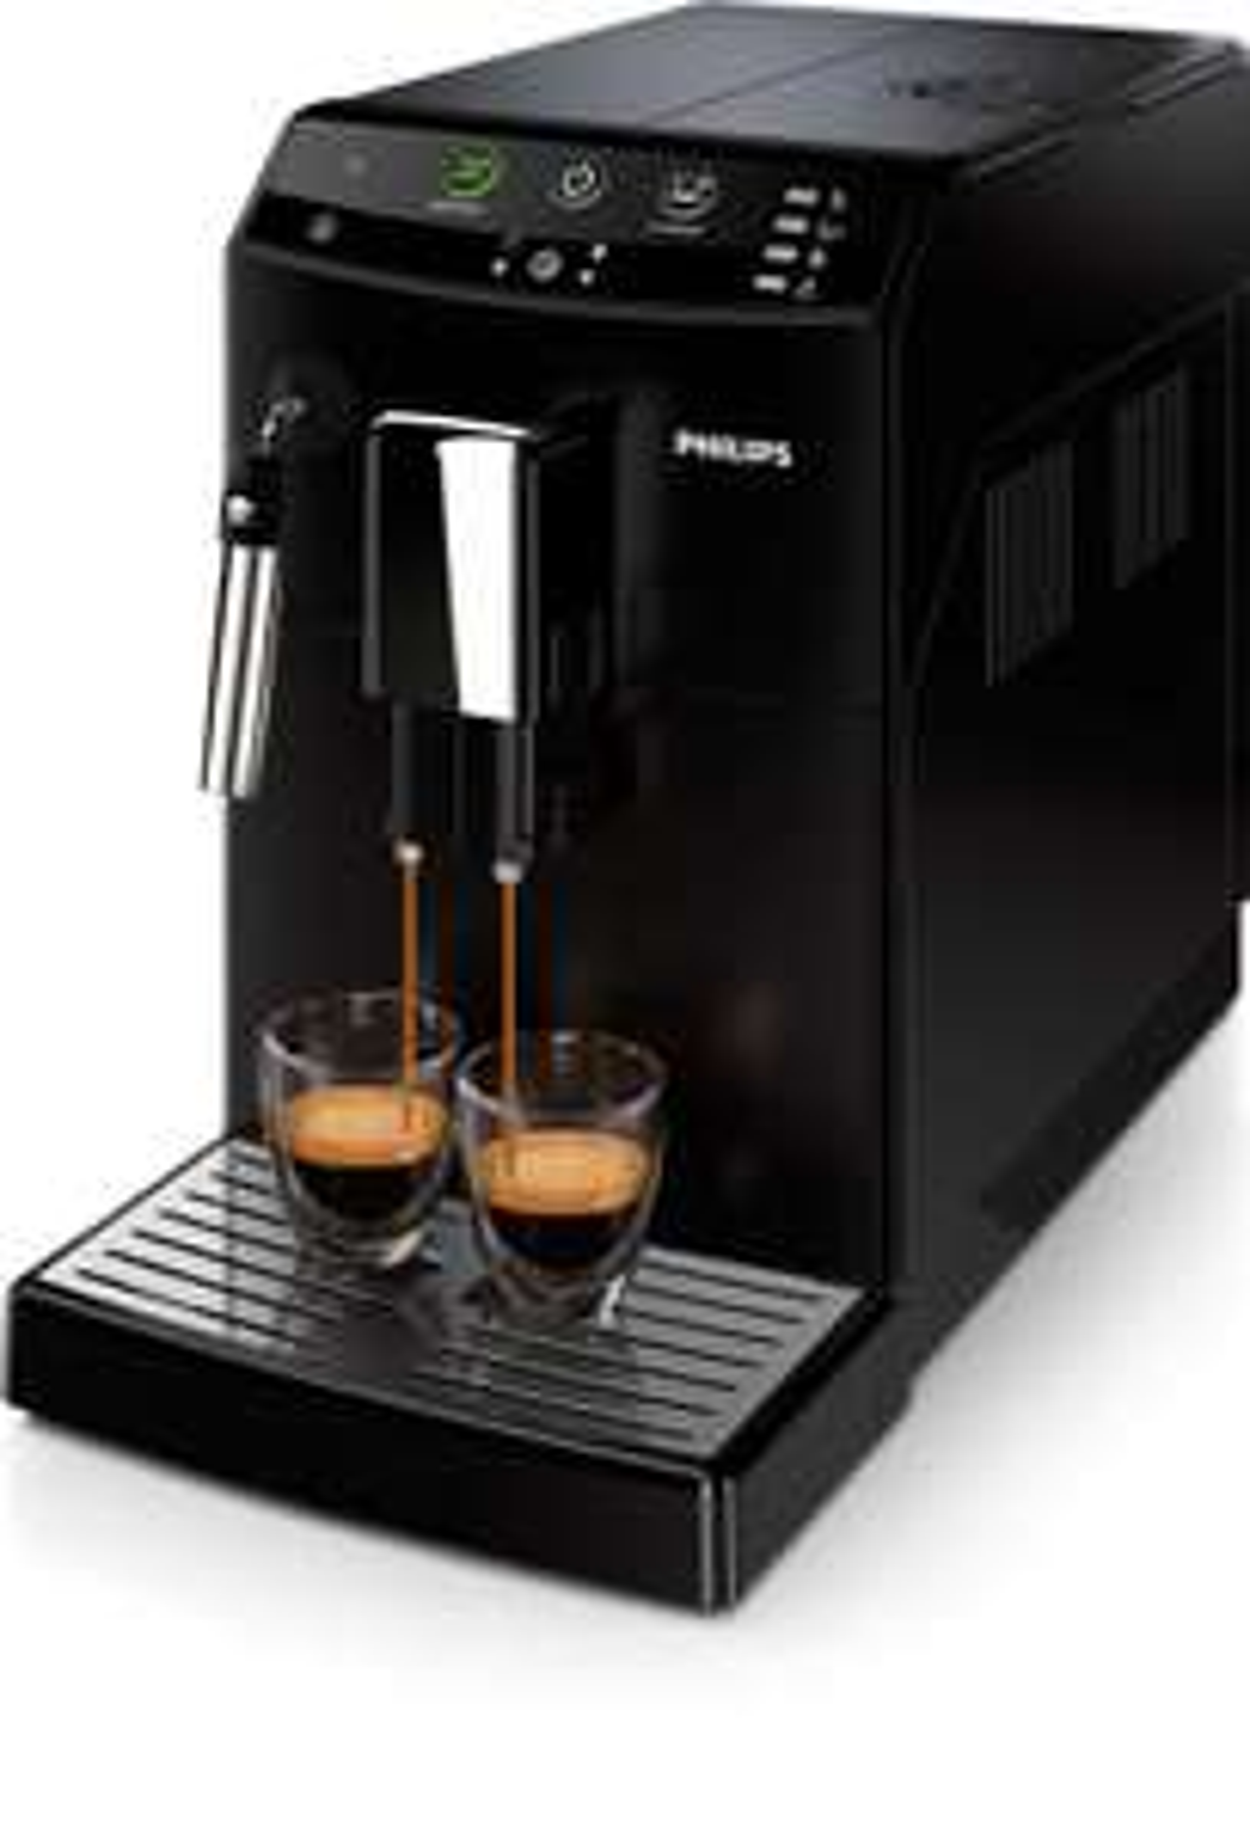 Machine expresso automatique Philips Serie 3000 CMF HD8821/01 - Noir